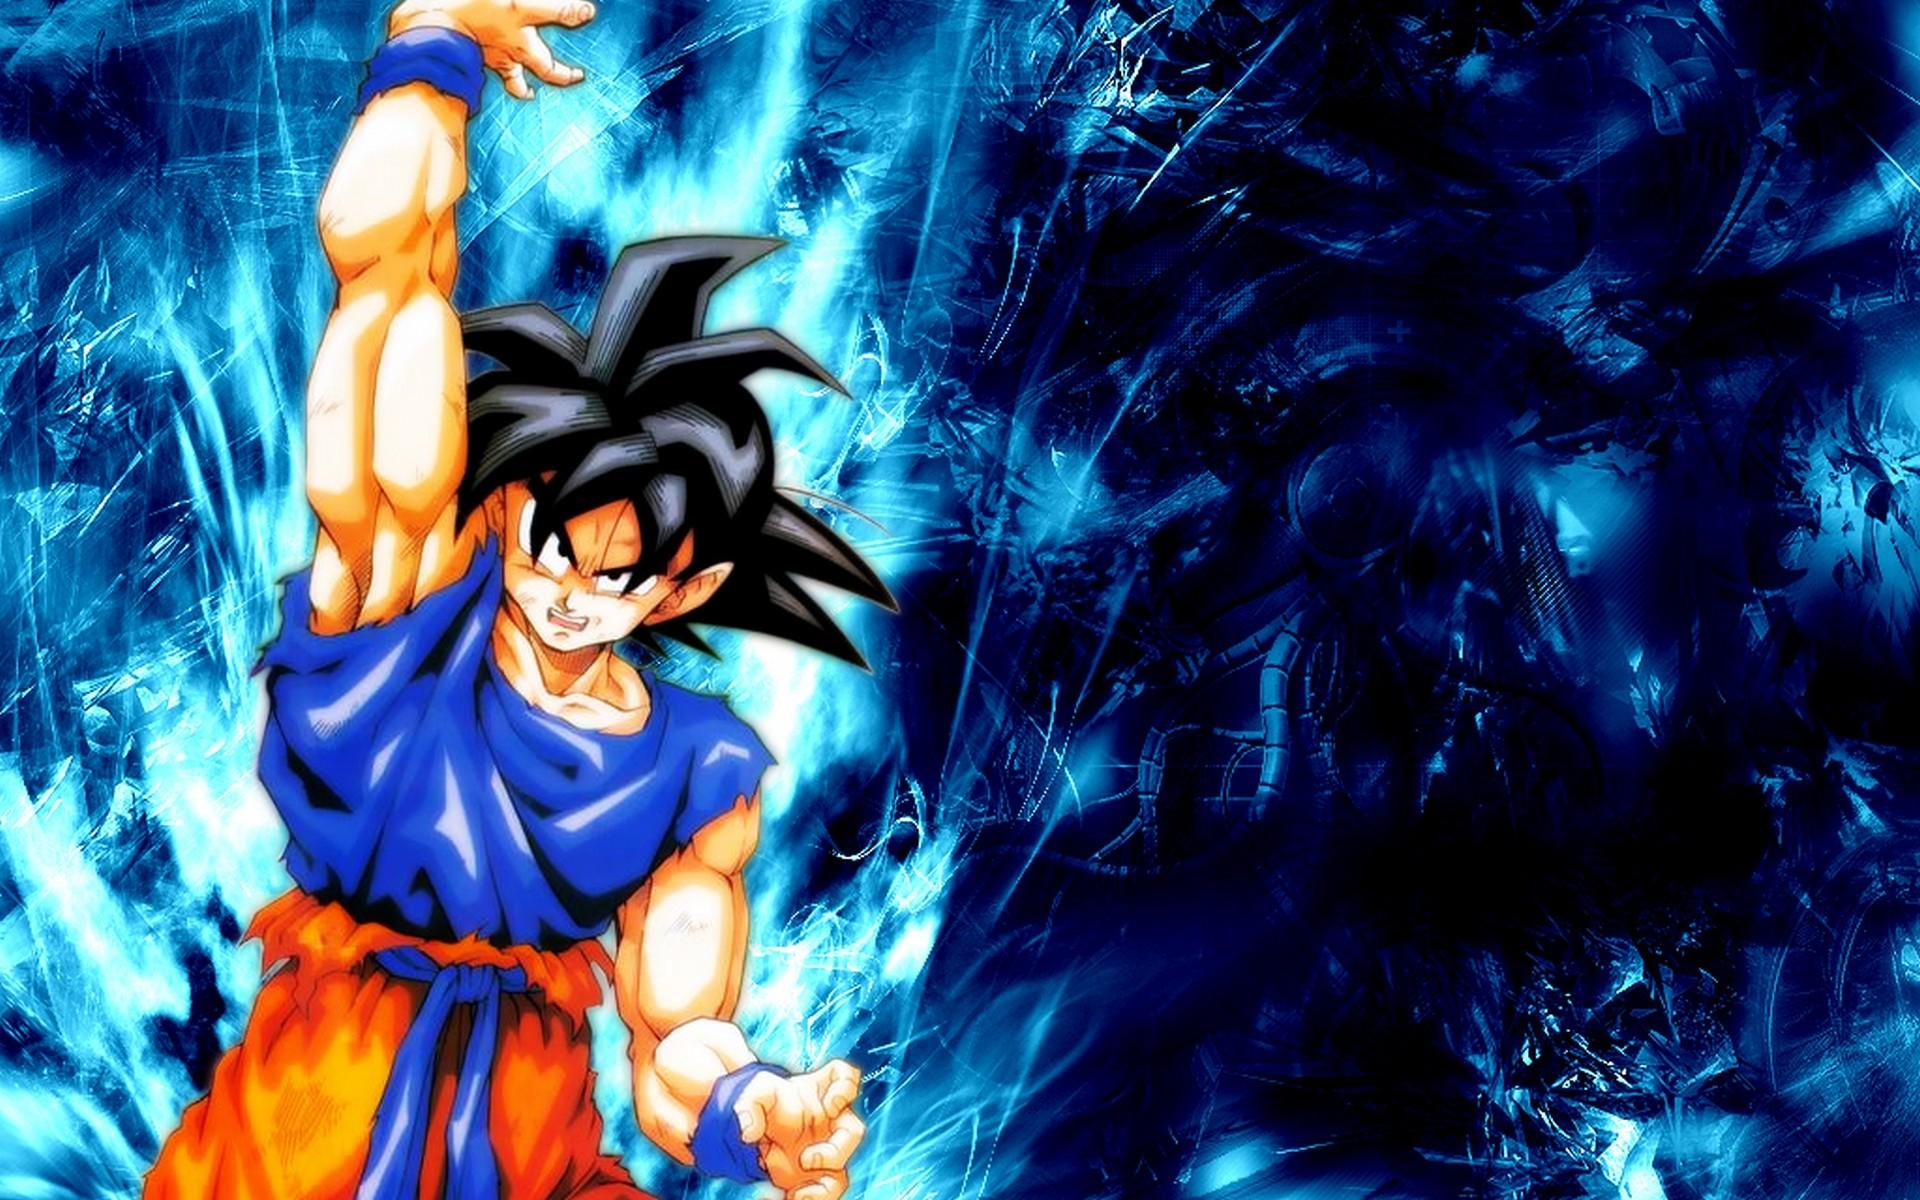 1920x1080 Super Saiyan God HD Wallpaper Goku